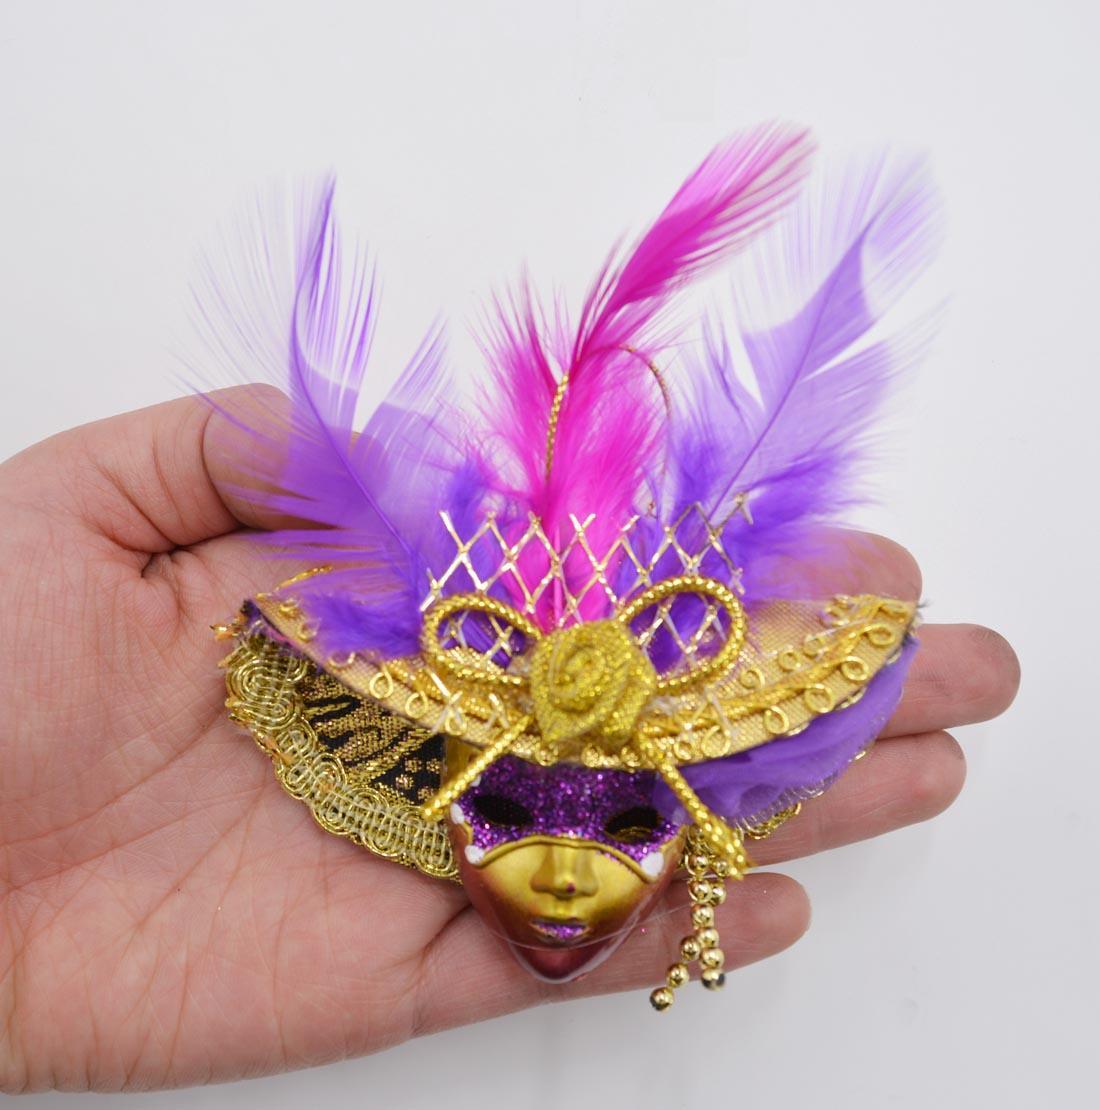 Masquerade Mini Masks Fridge Magnet Sticker Mardi Gras Party Decoration Little Beauty Venetian Party Mask Whiteboard Notes Sticker